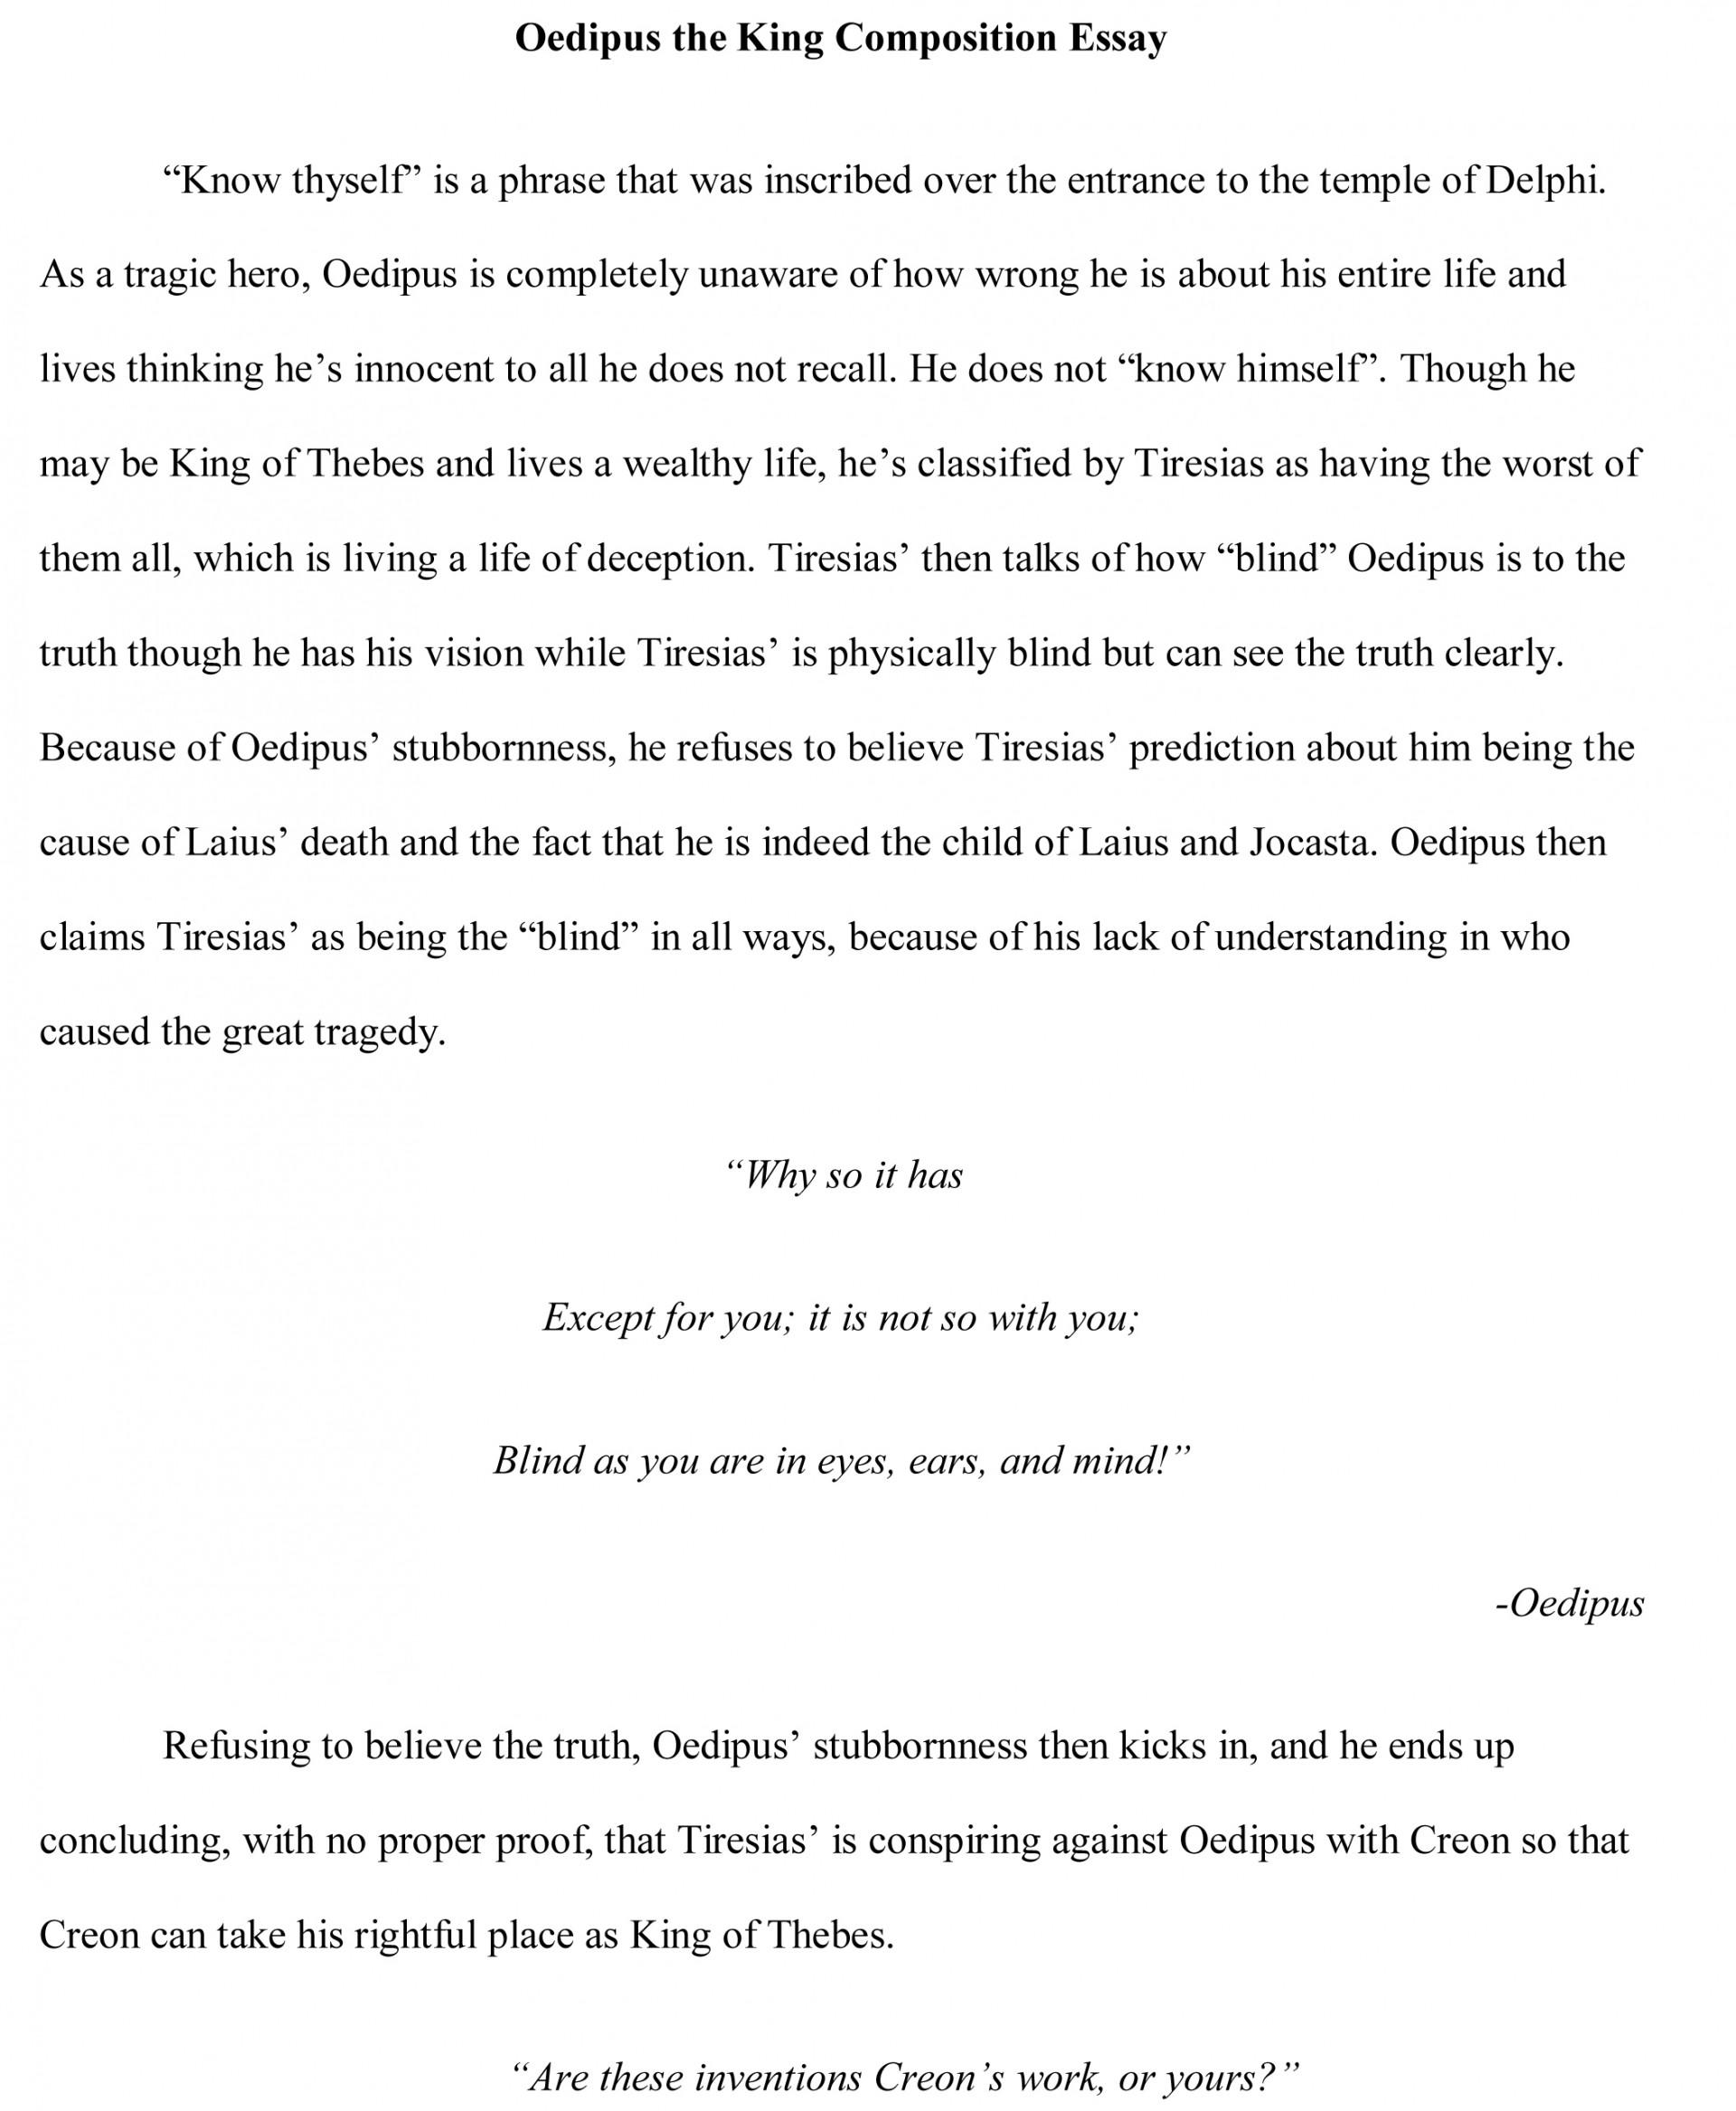 003 Essay Example Oedipus Free Sample Automatic Singular Grader 1920